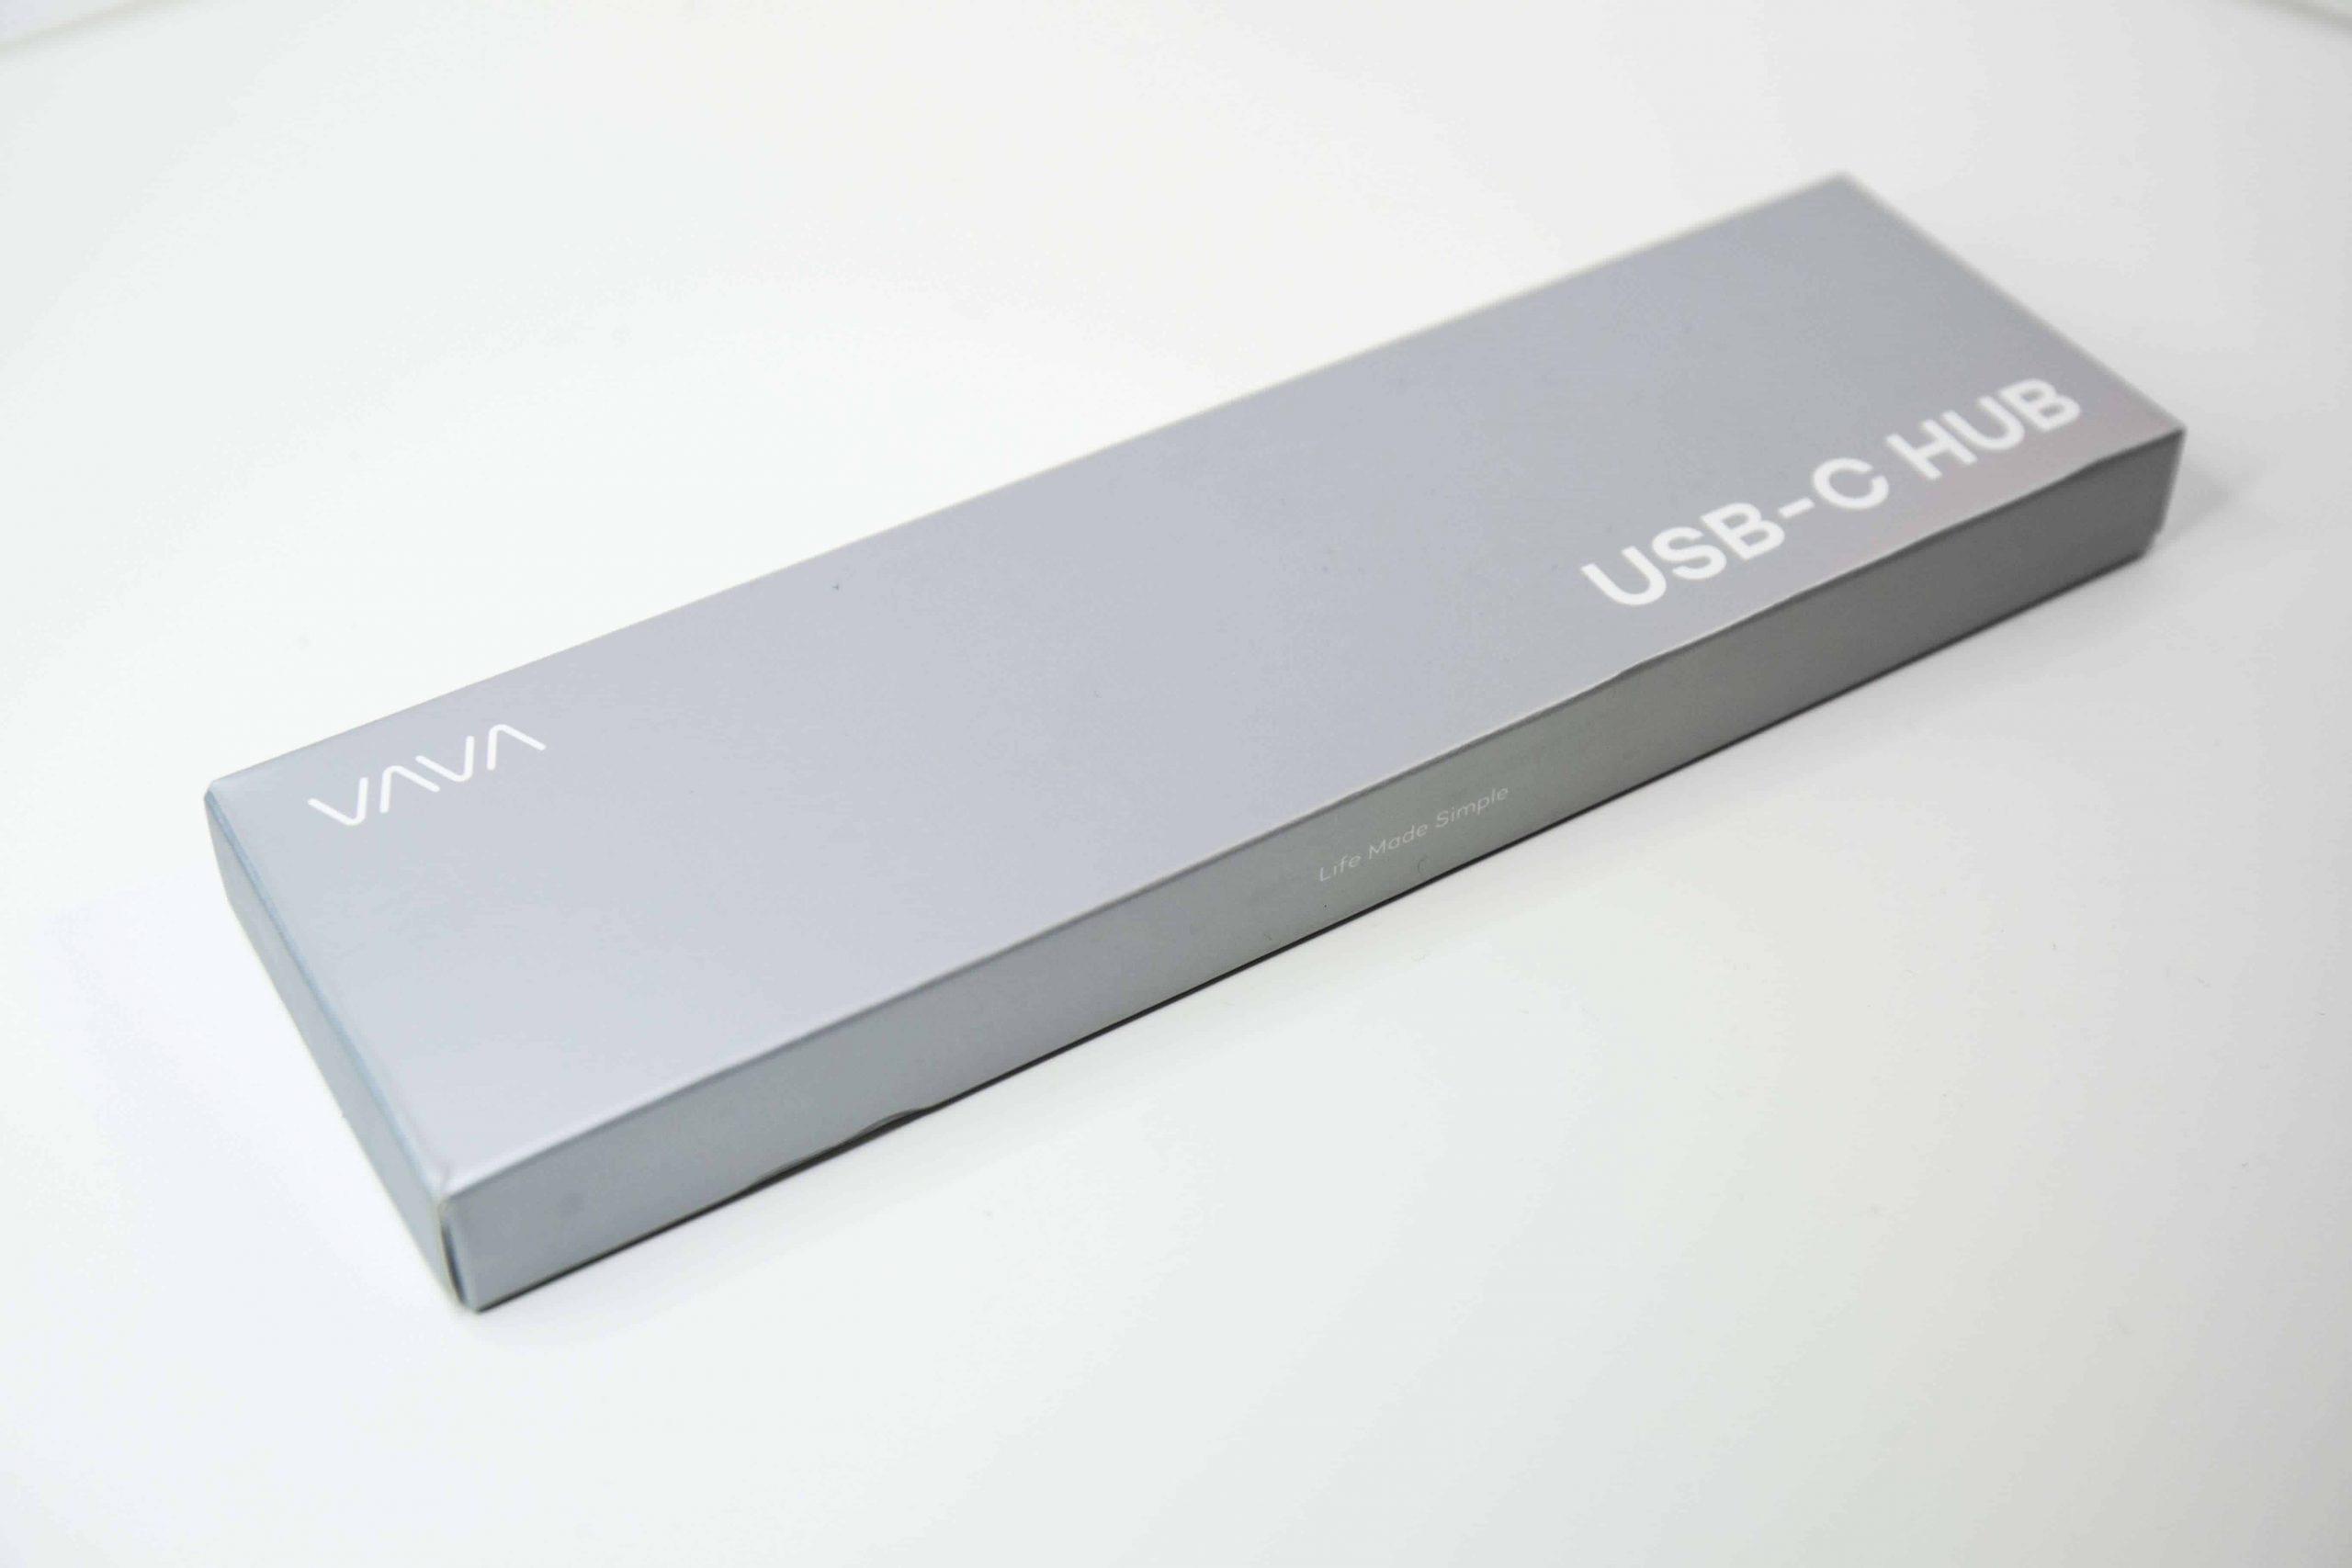 Macbook 周邊推薦!VAVA Type-C Hub 輕鬆轉接HDMI等8大功能開箱評測-TechTeller (科技說)